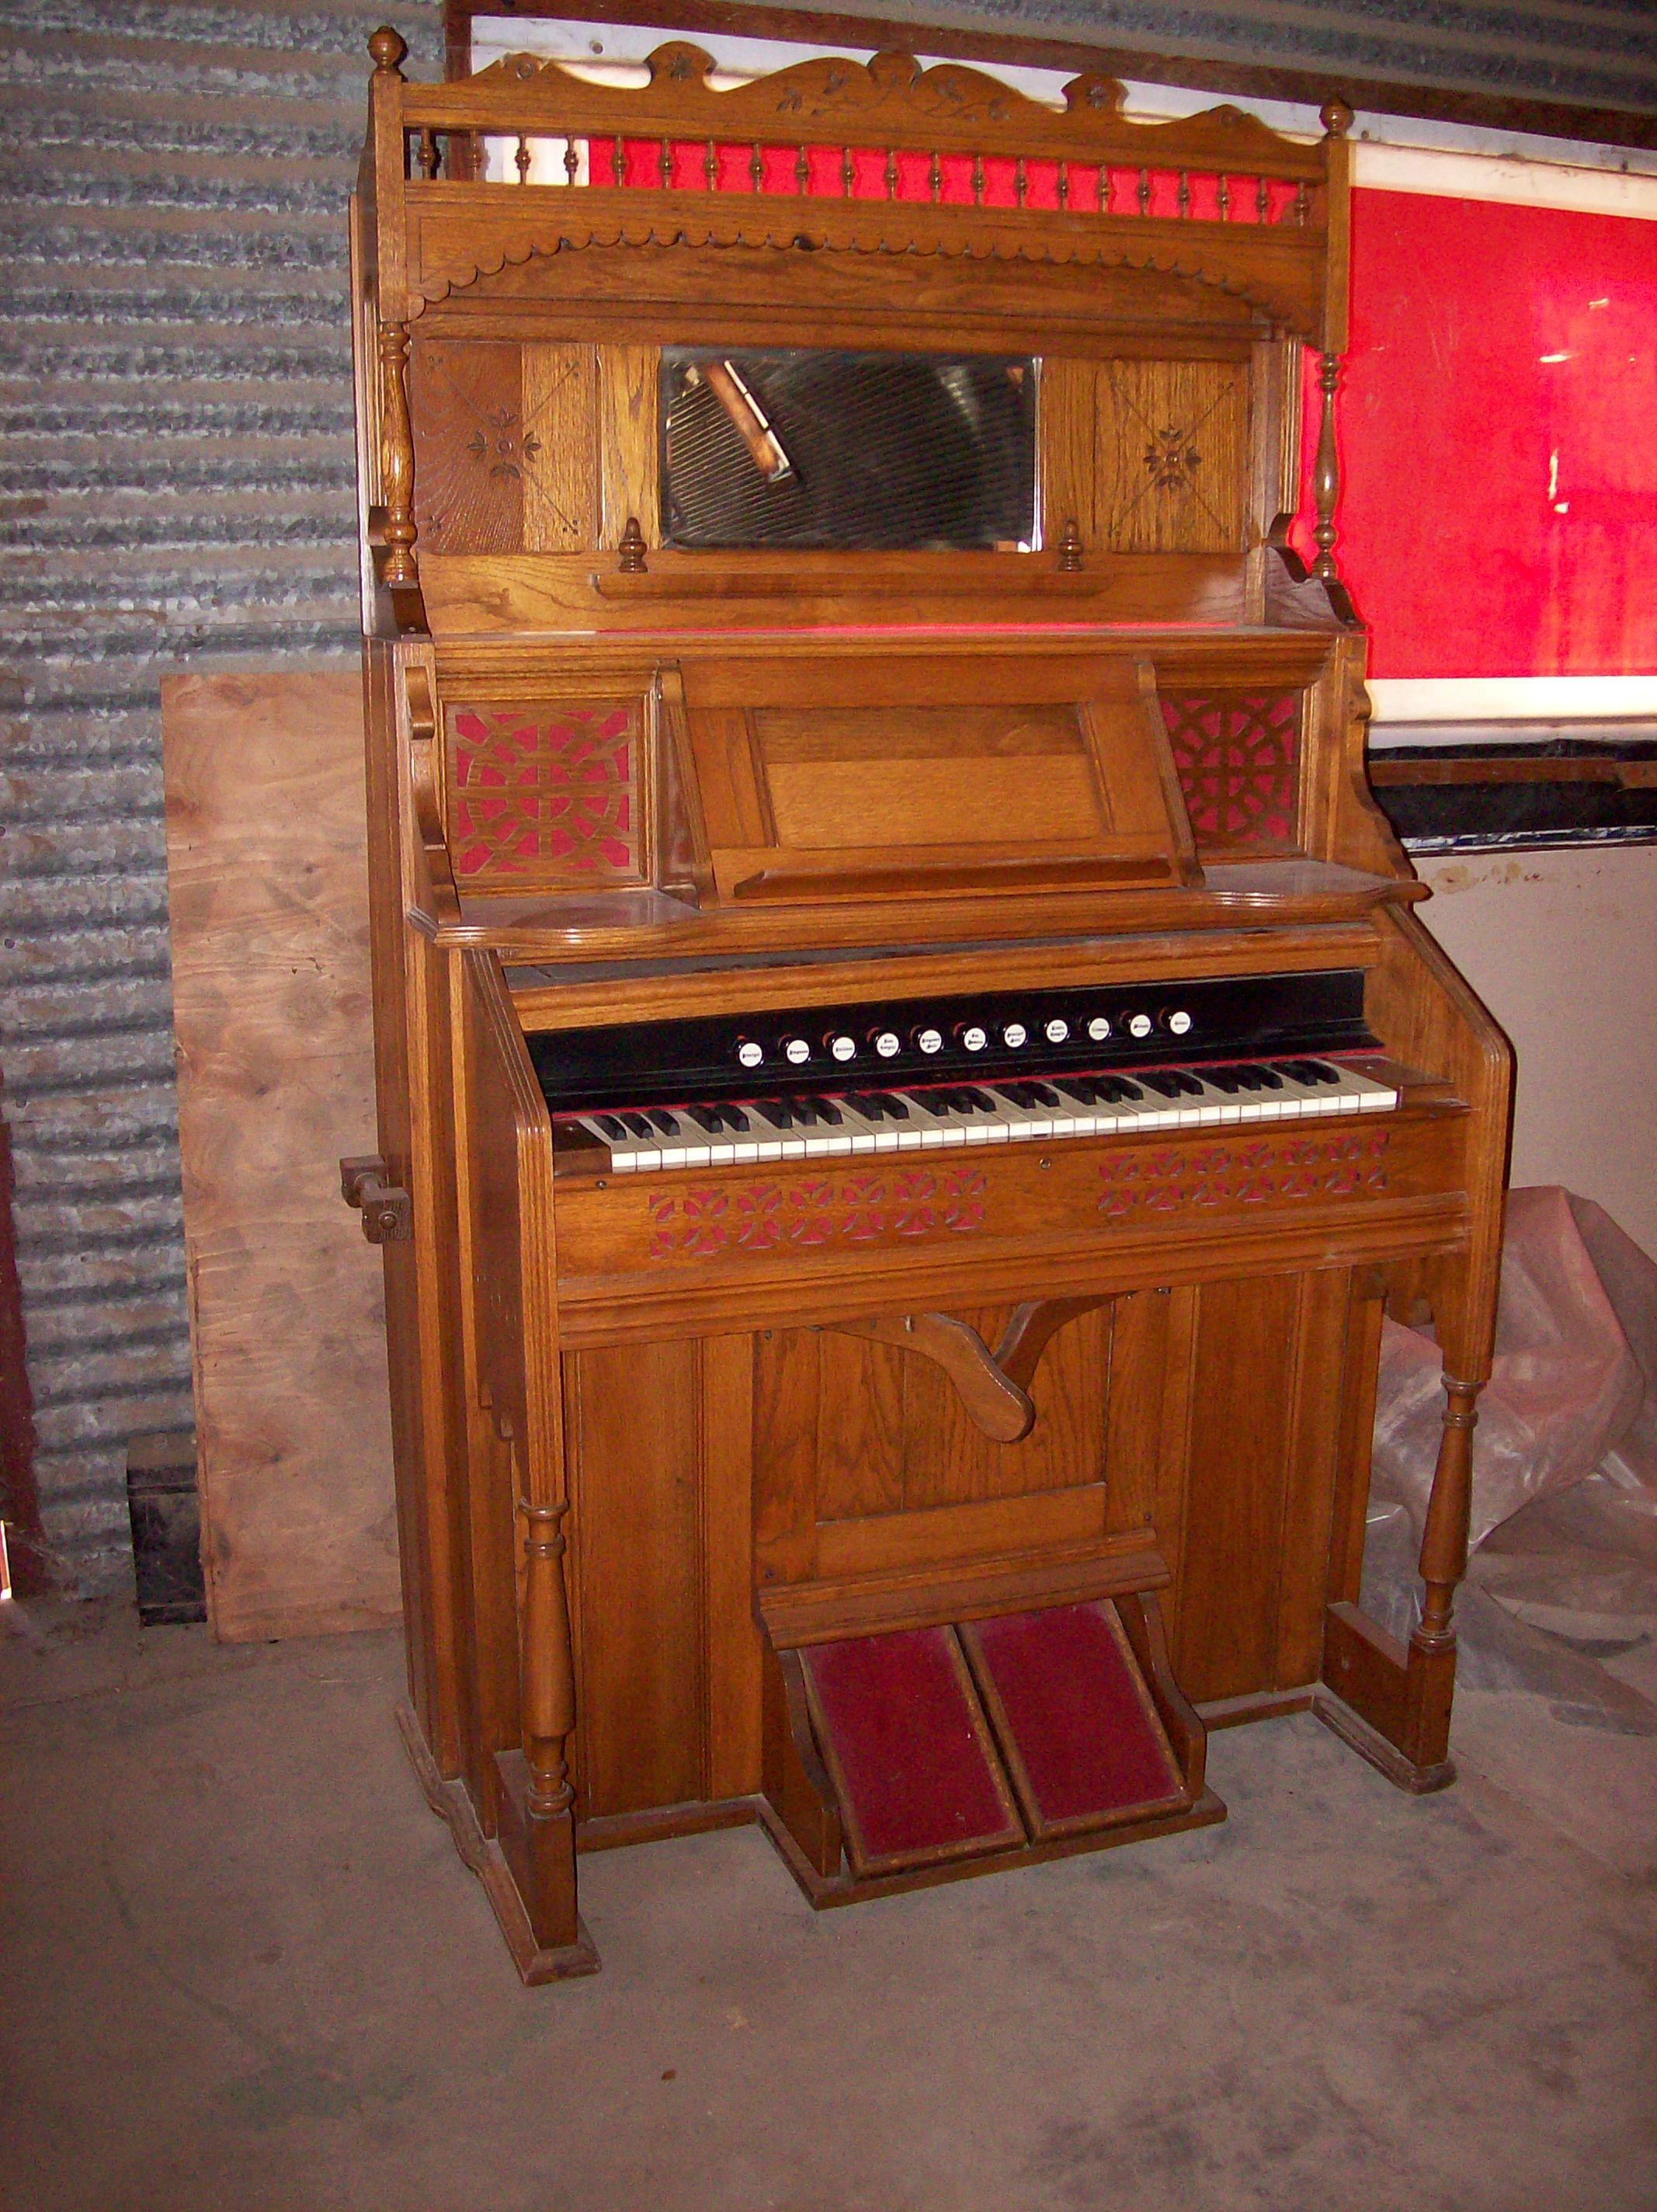 Kimball Victorian Furniture Beckwith+Pump+Organ+1905 Kimball Organ Co.